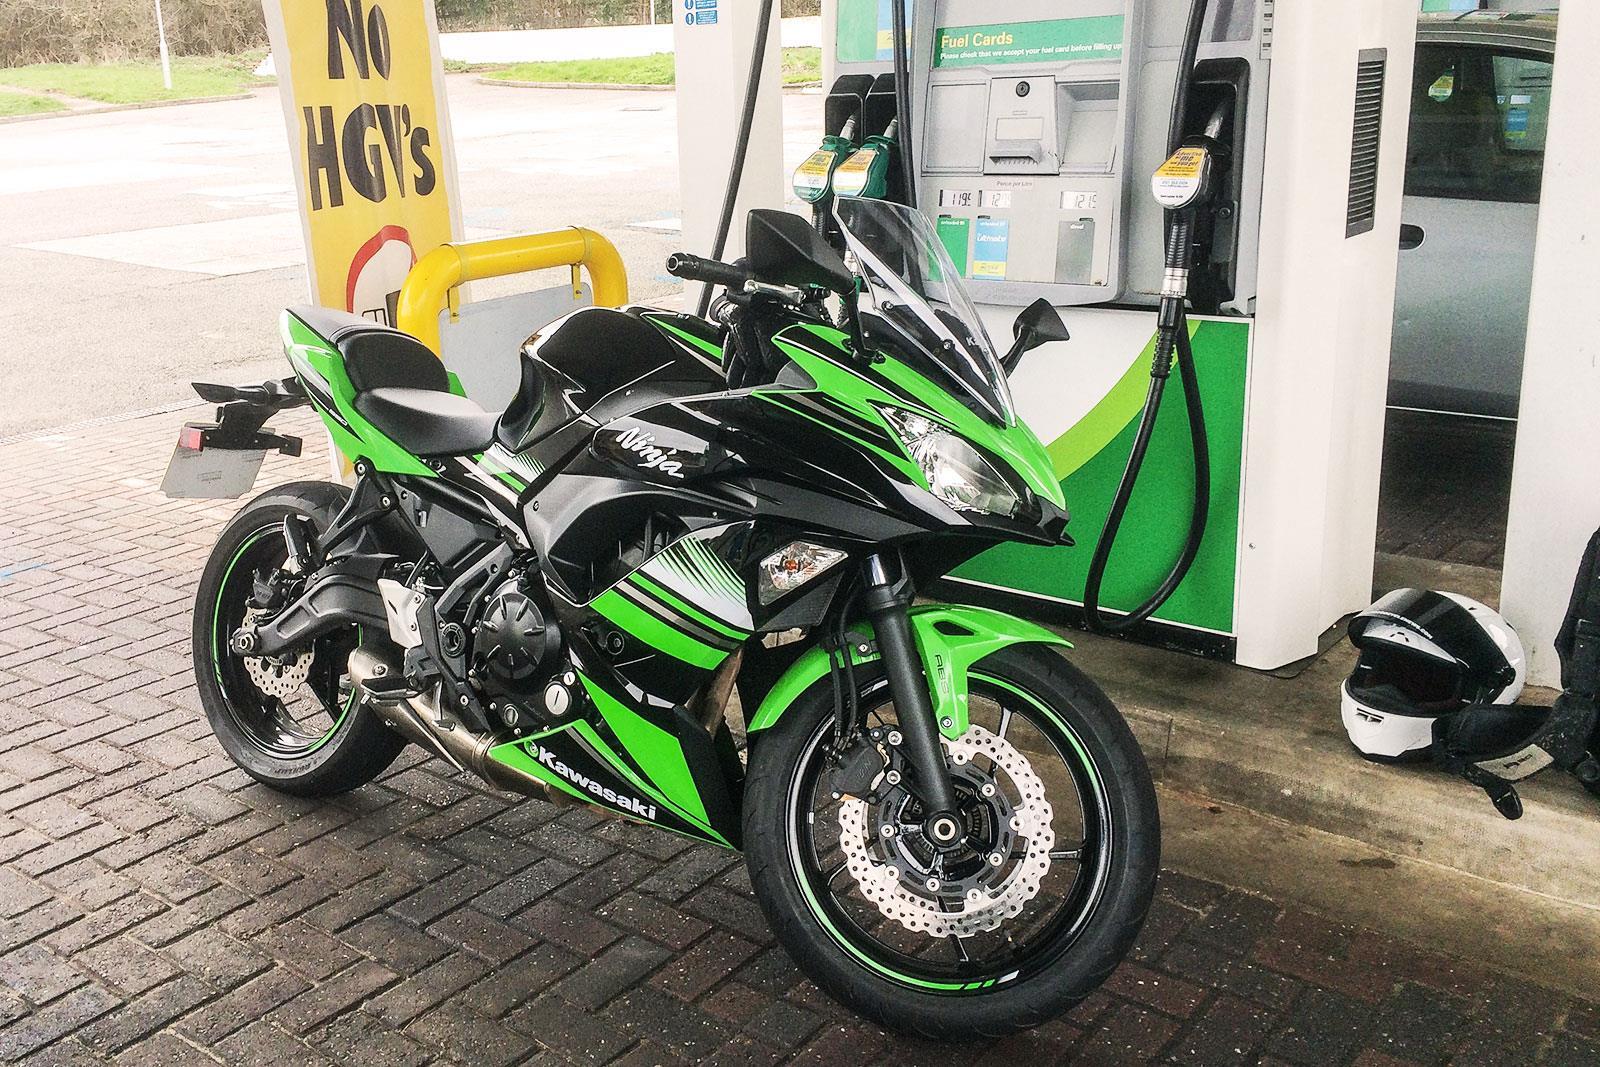 Kawasaki Ninja 650 fuel stop